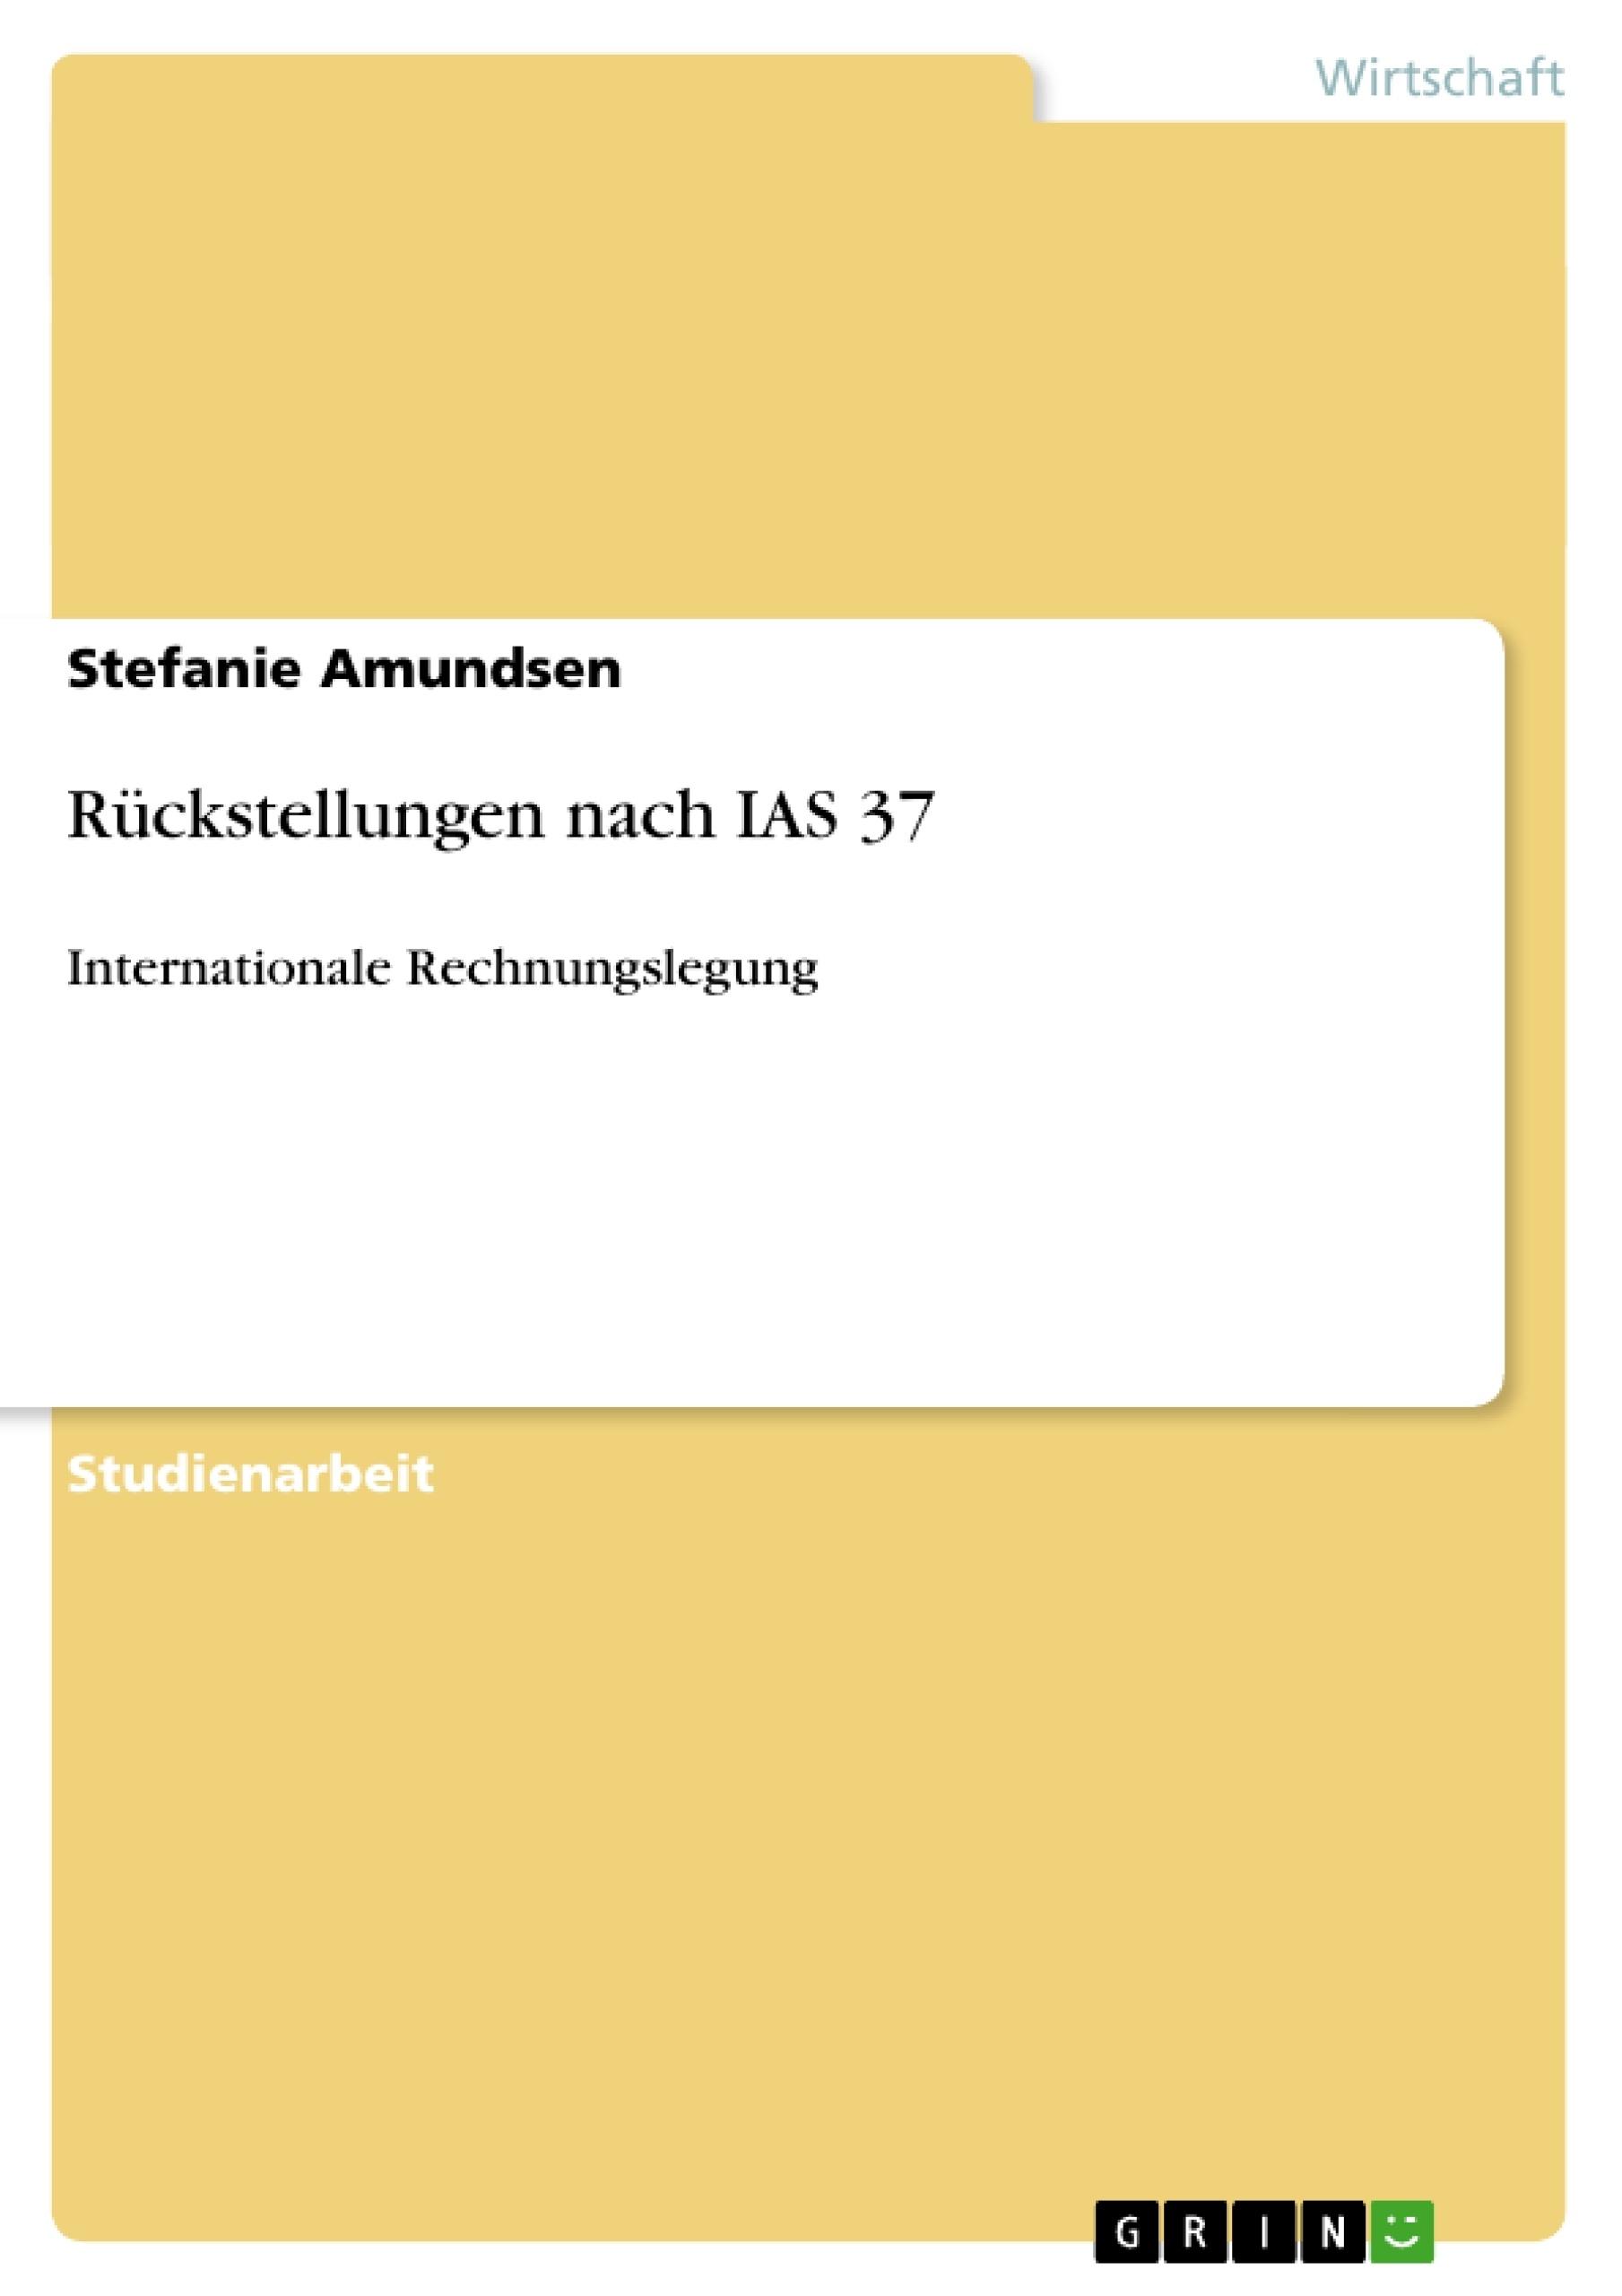 Titel: Rückstellungen nach IAS 37